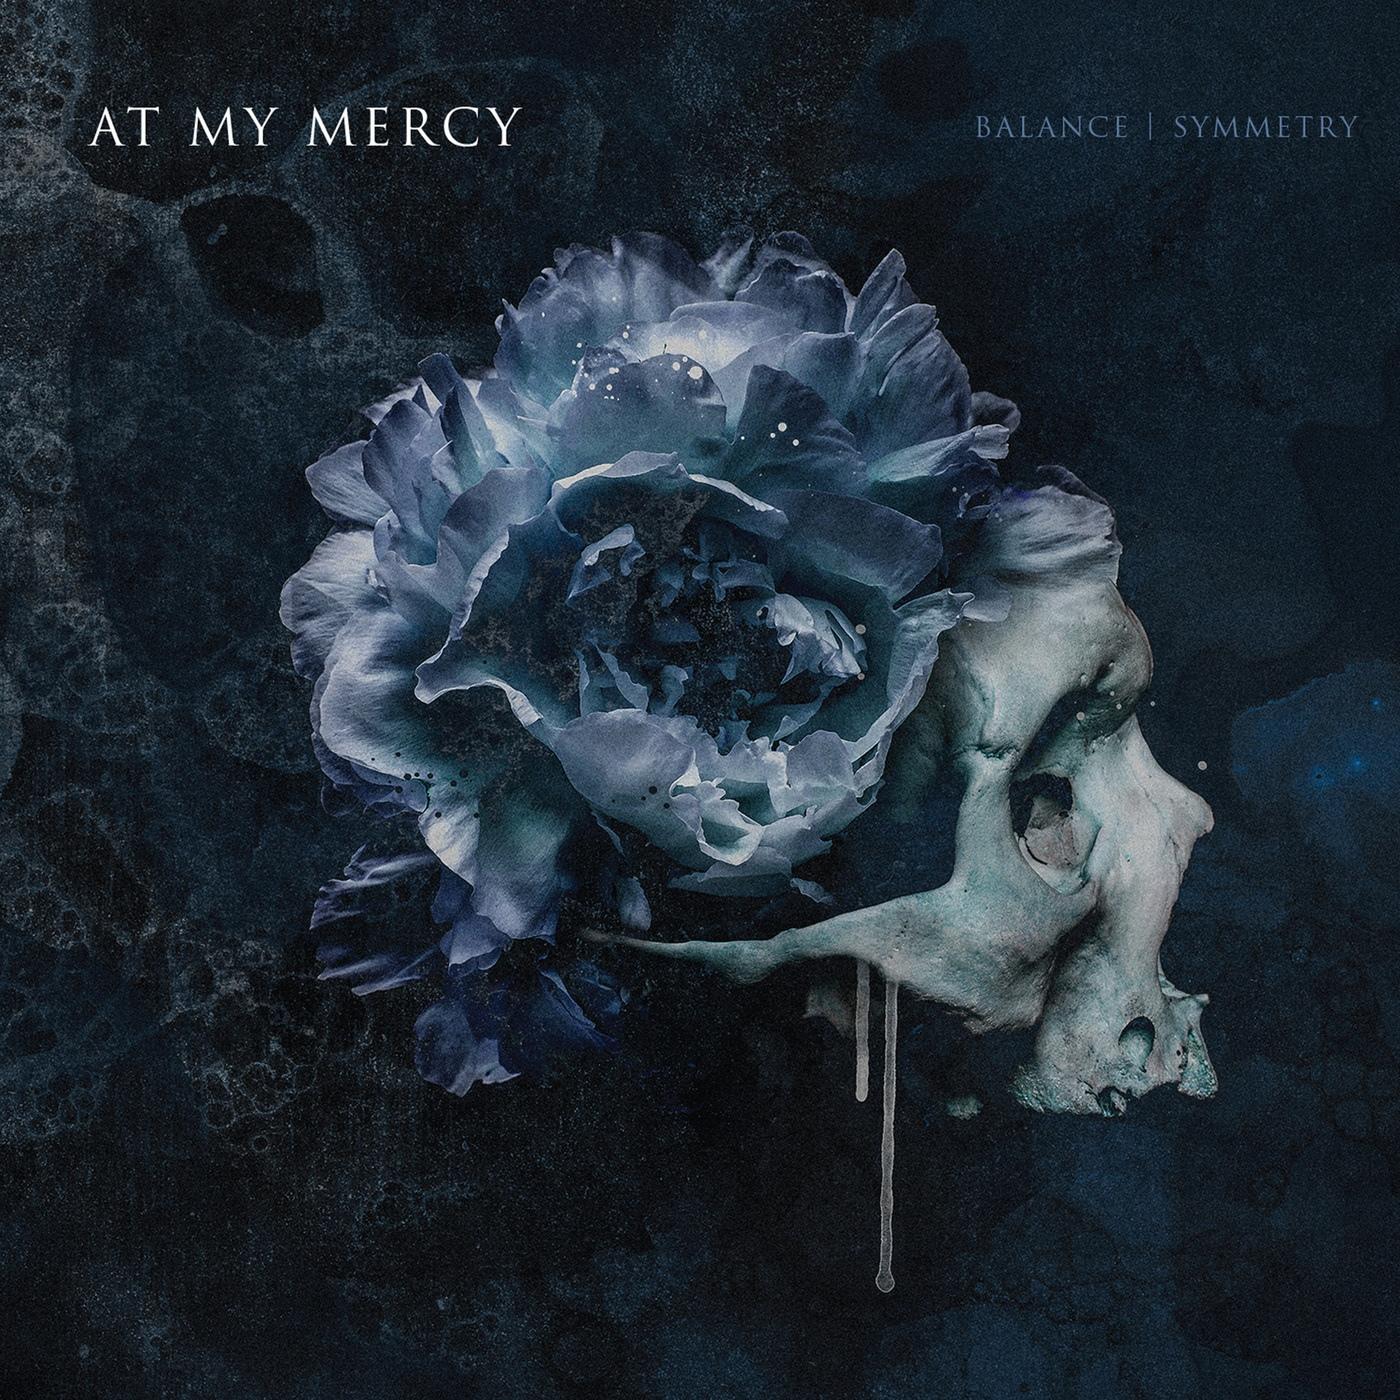 At My Mercy - Balance | Symmetry (2019)